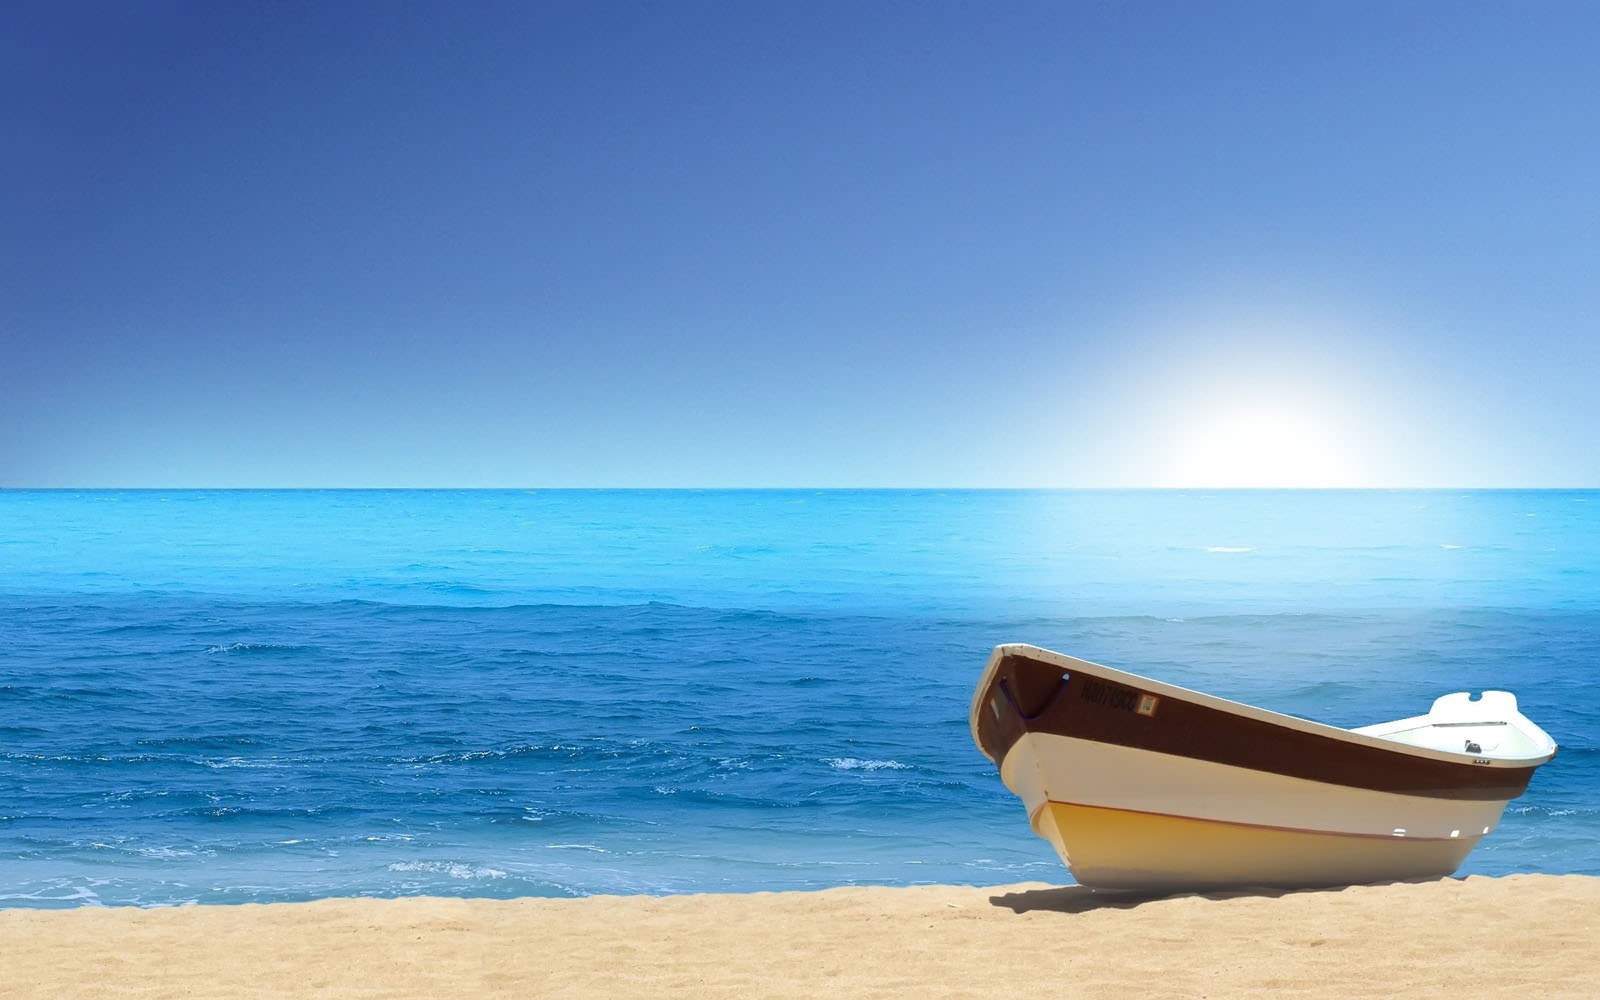 dreamy-beach-wallpaper